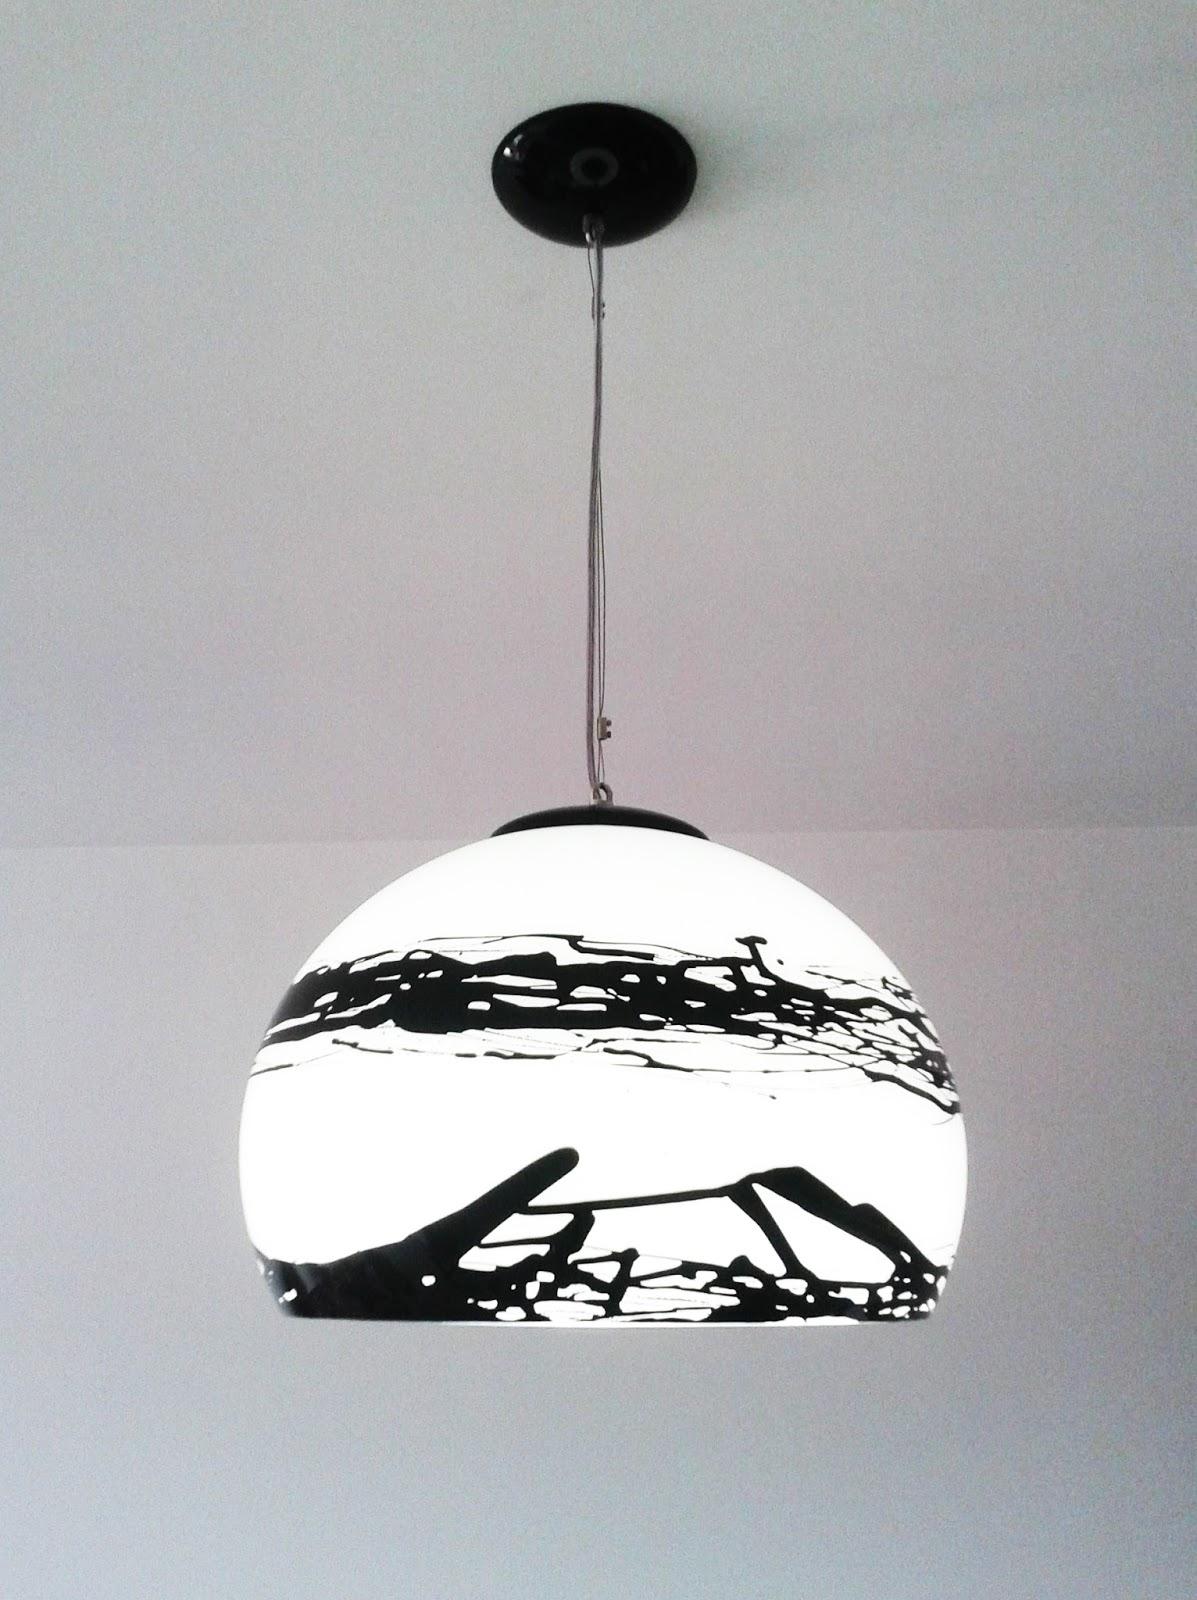 Ludica iluminacion lamparas de acrilico de techo colgantes - Lamparas techo modernas ...